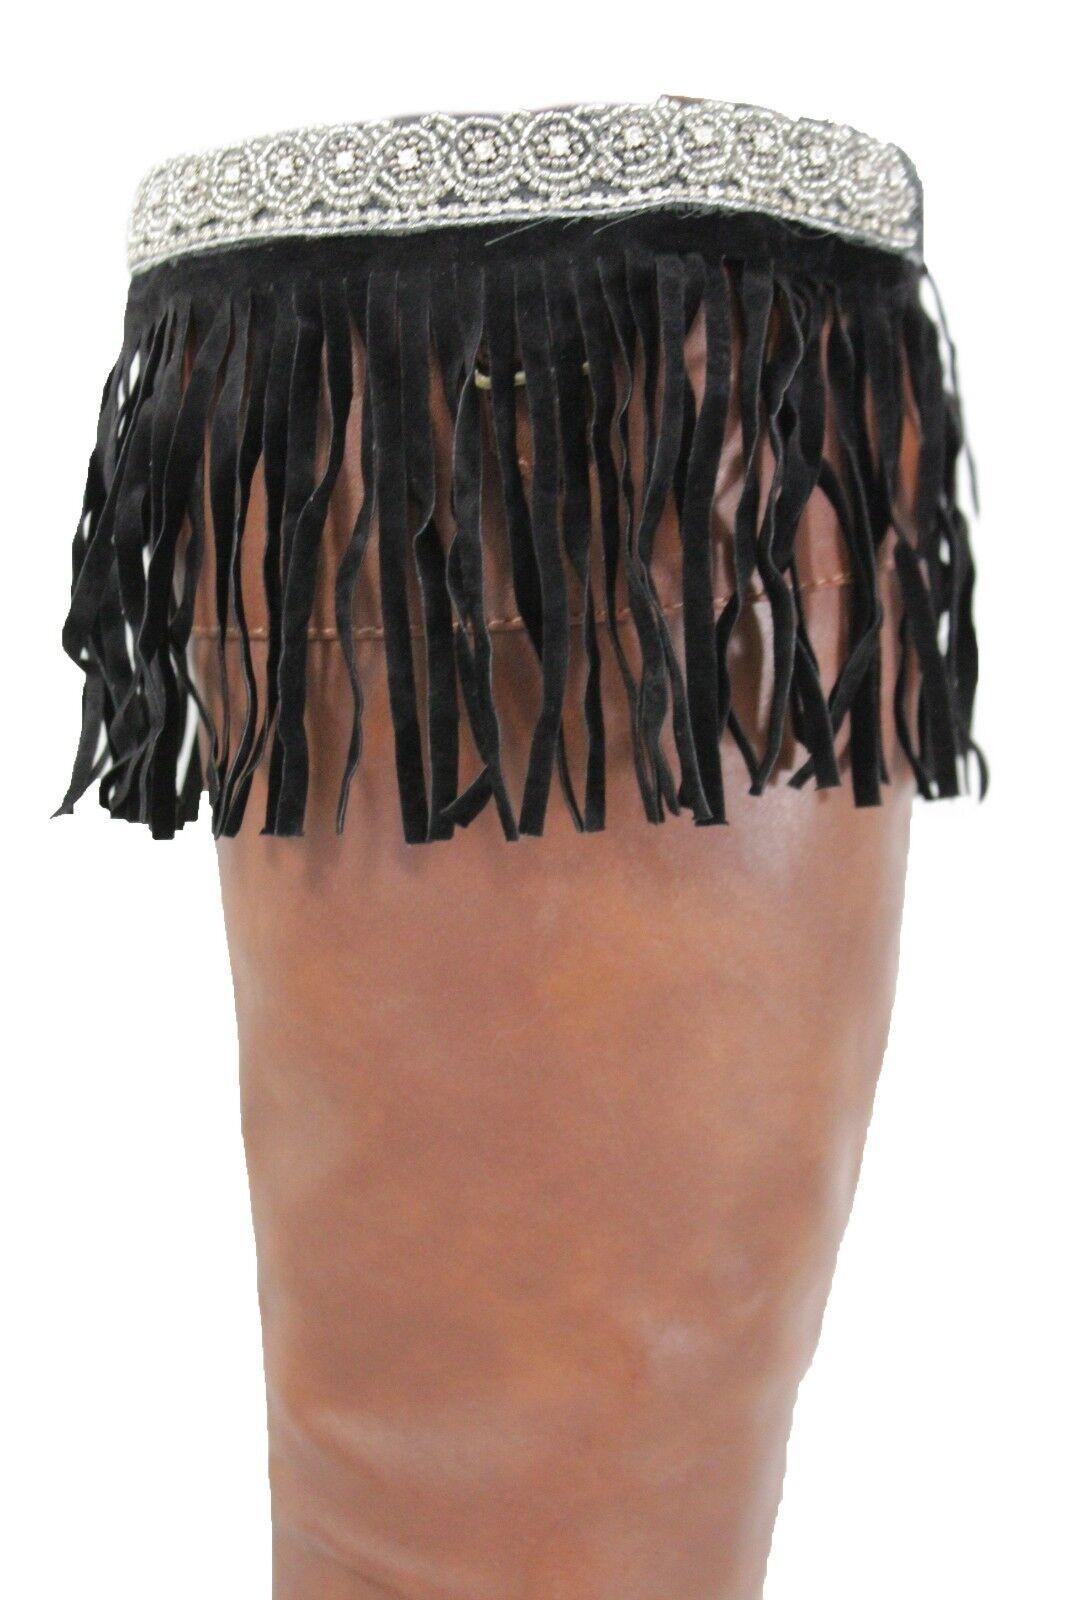 Women Ethnic Native Style Boot Topper Winter Silver Beads Long Black Fringe Pair